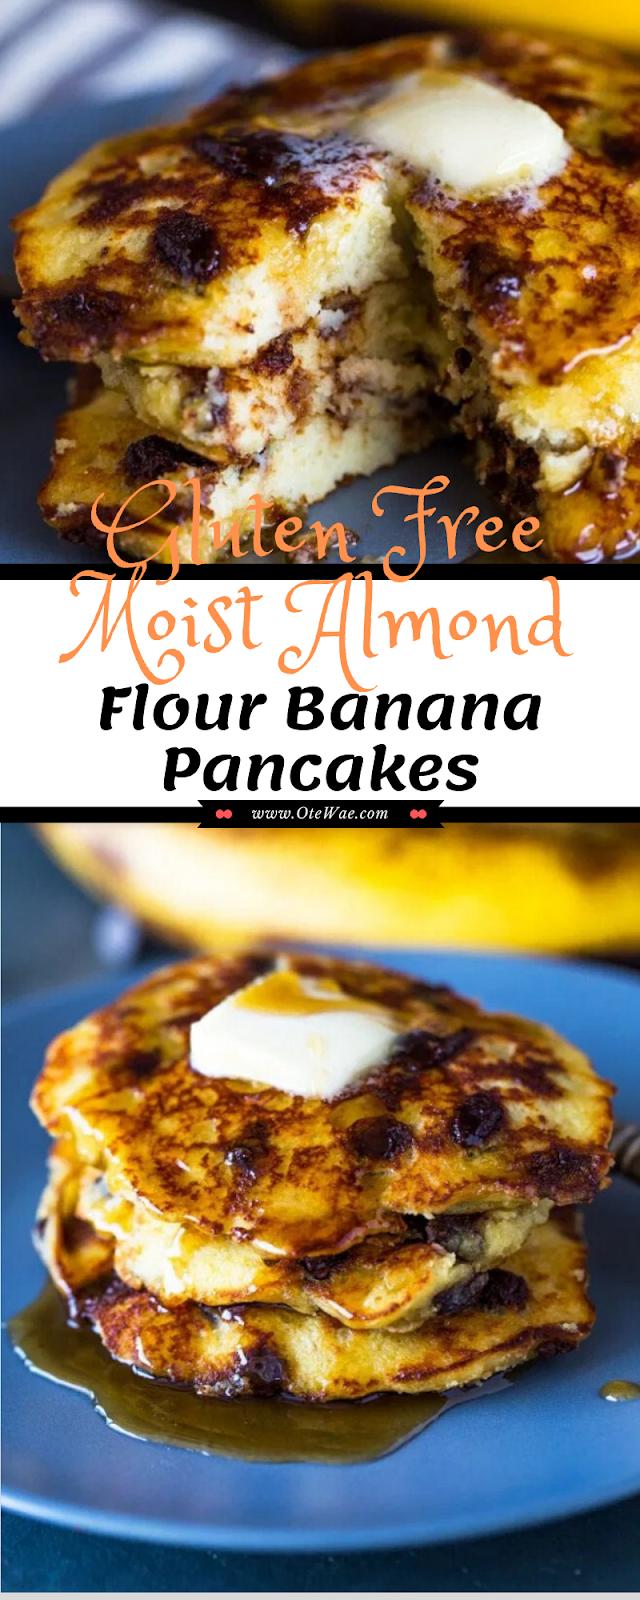 Gluten Free Moist Almond Flour Banana Pancakes